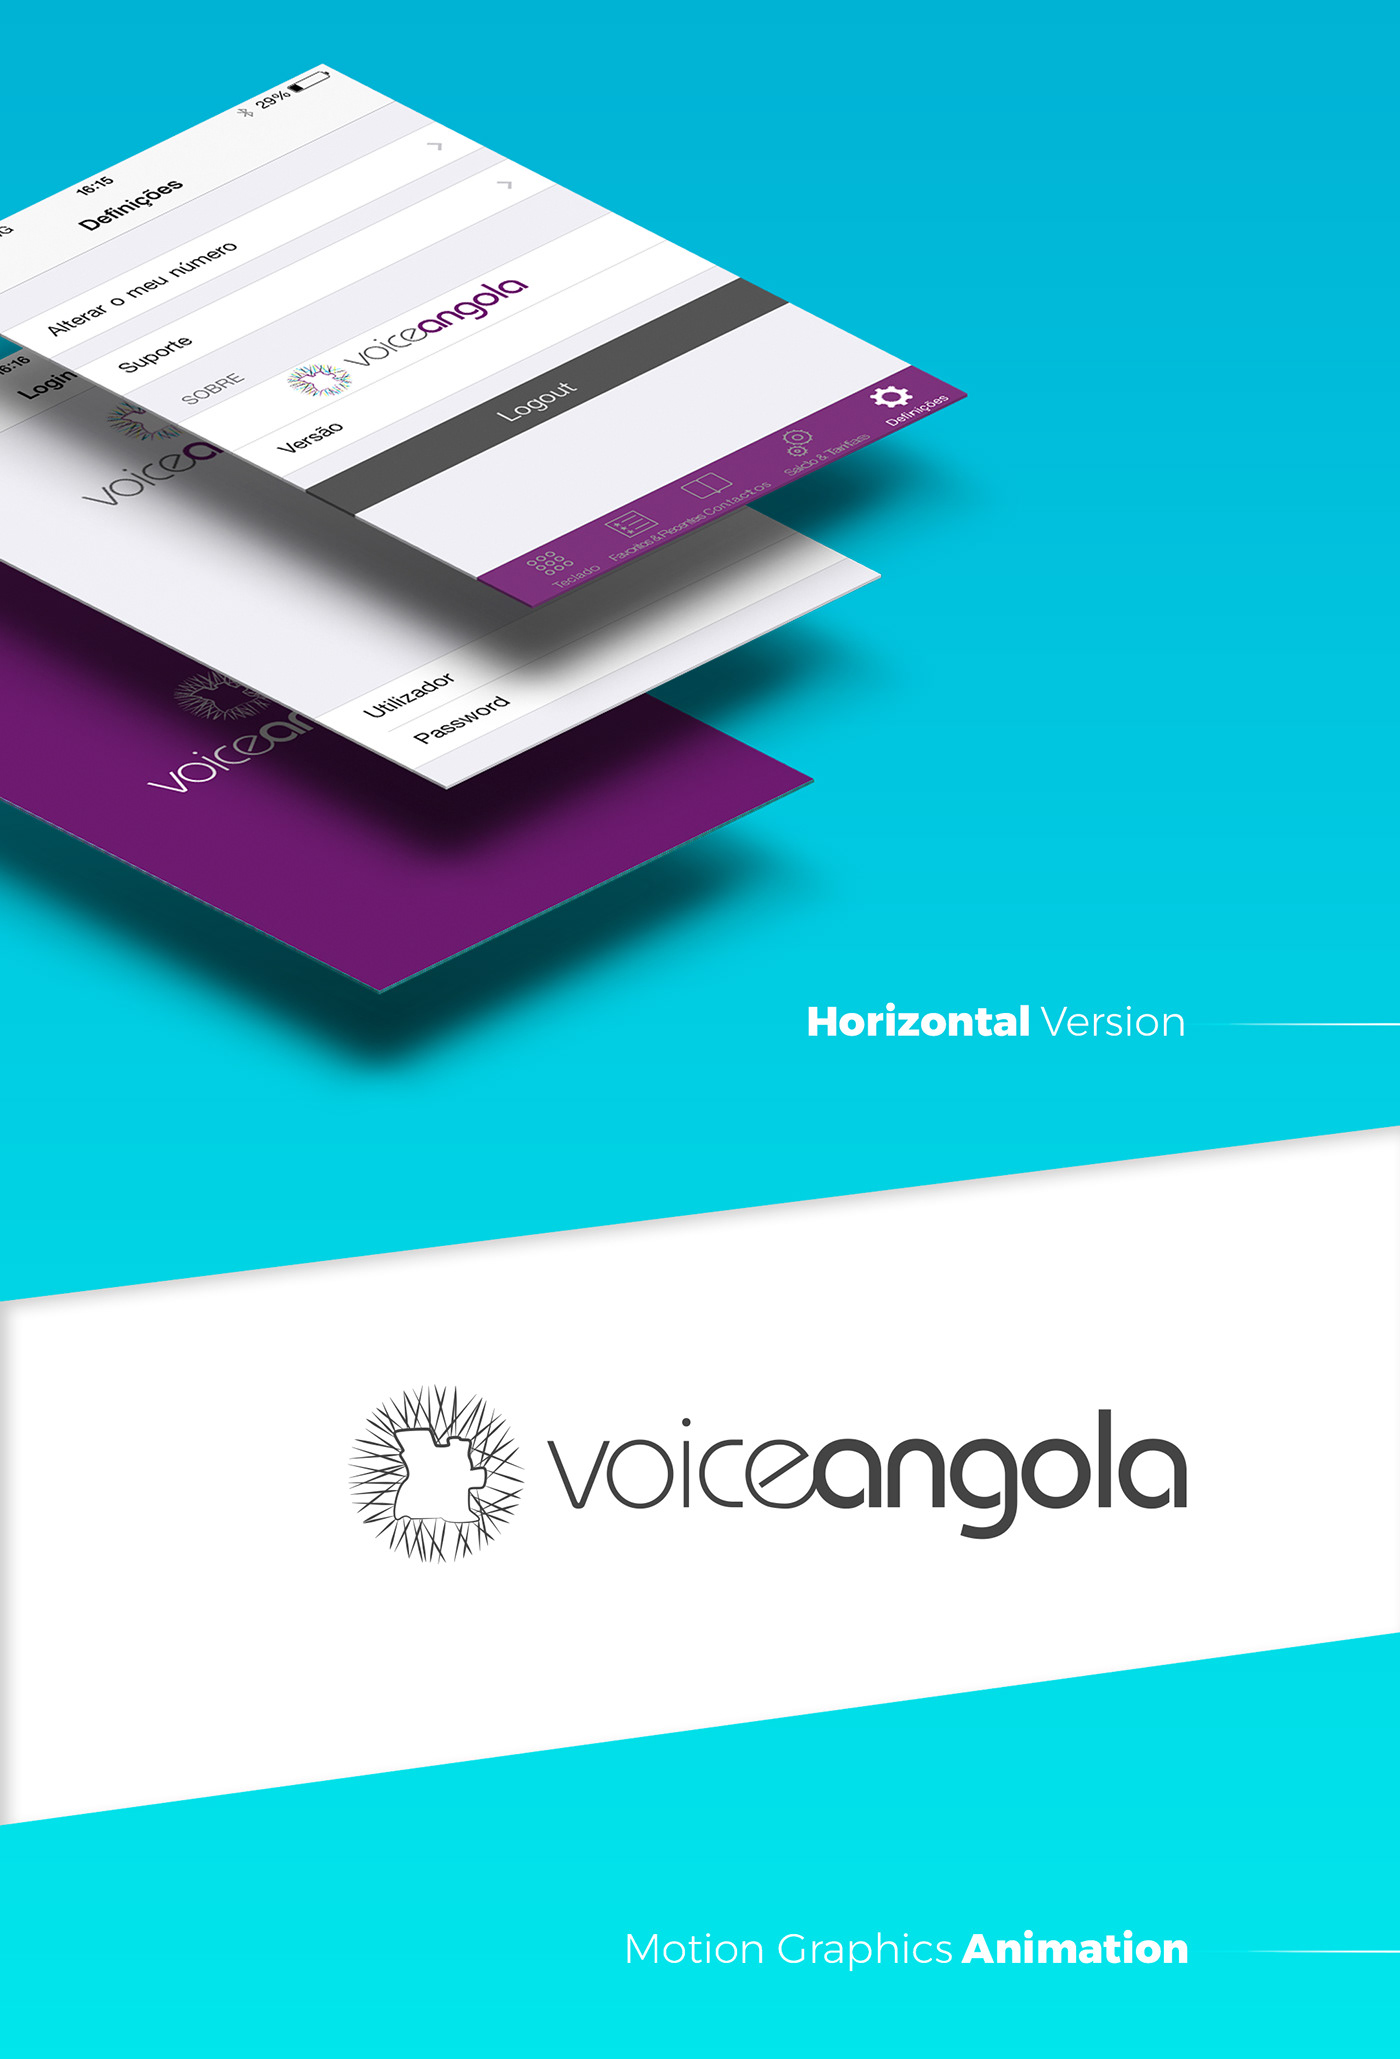 Logo Design copy logo app Voice Angola logo ios VoIP Travel Flights Icon